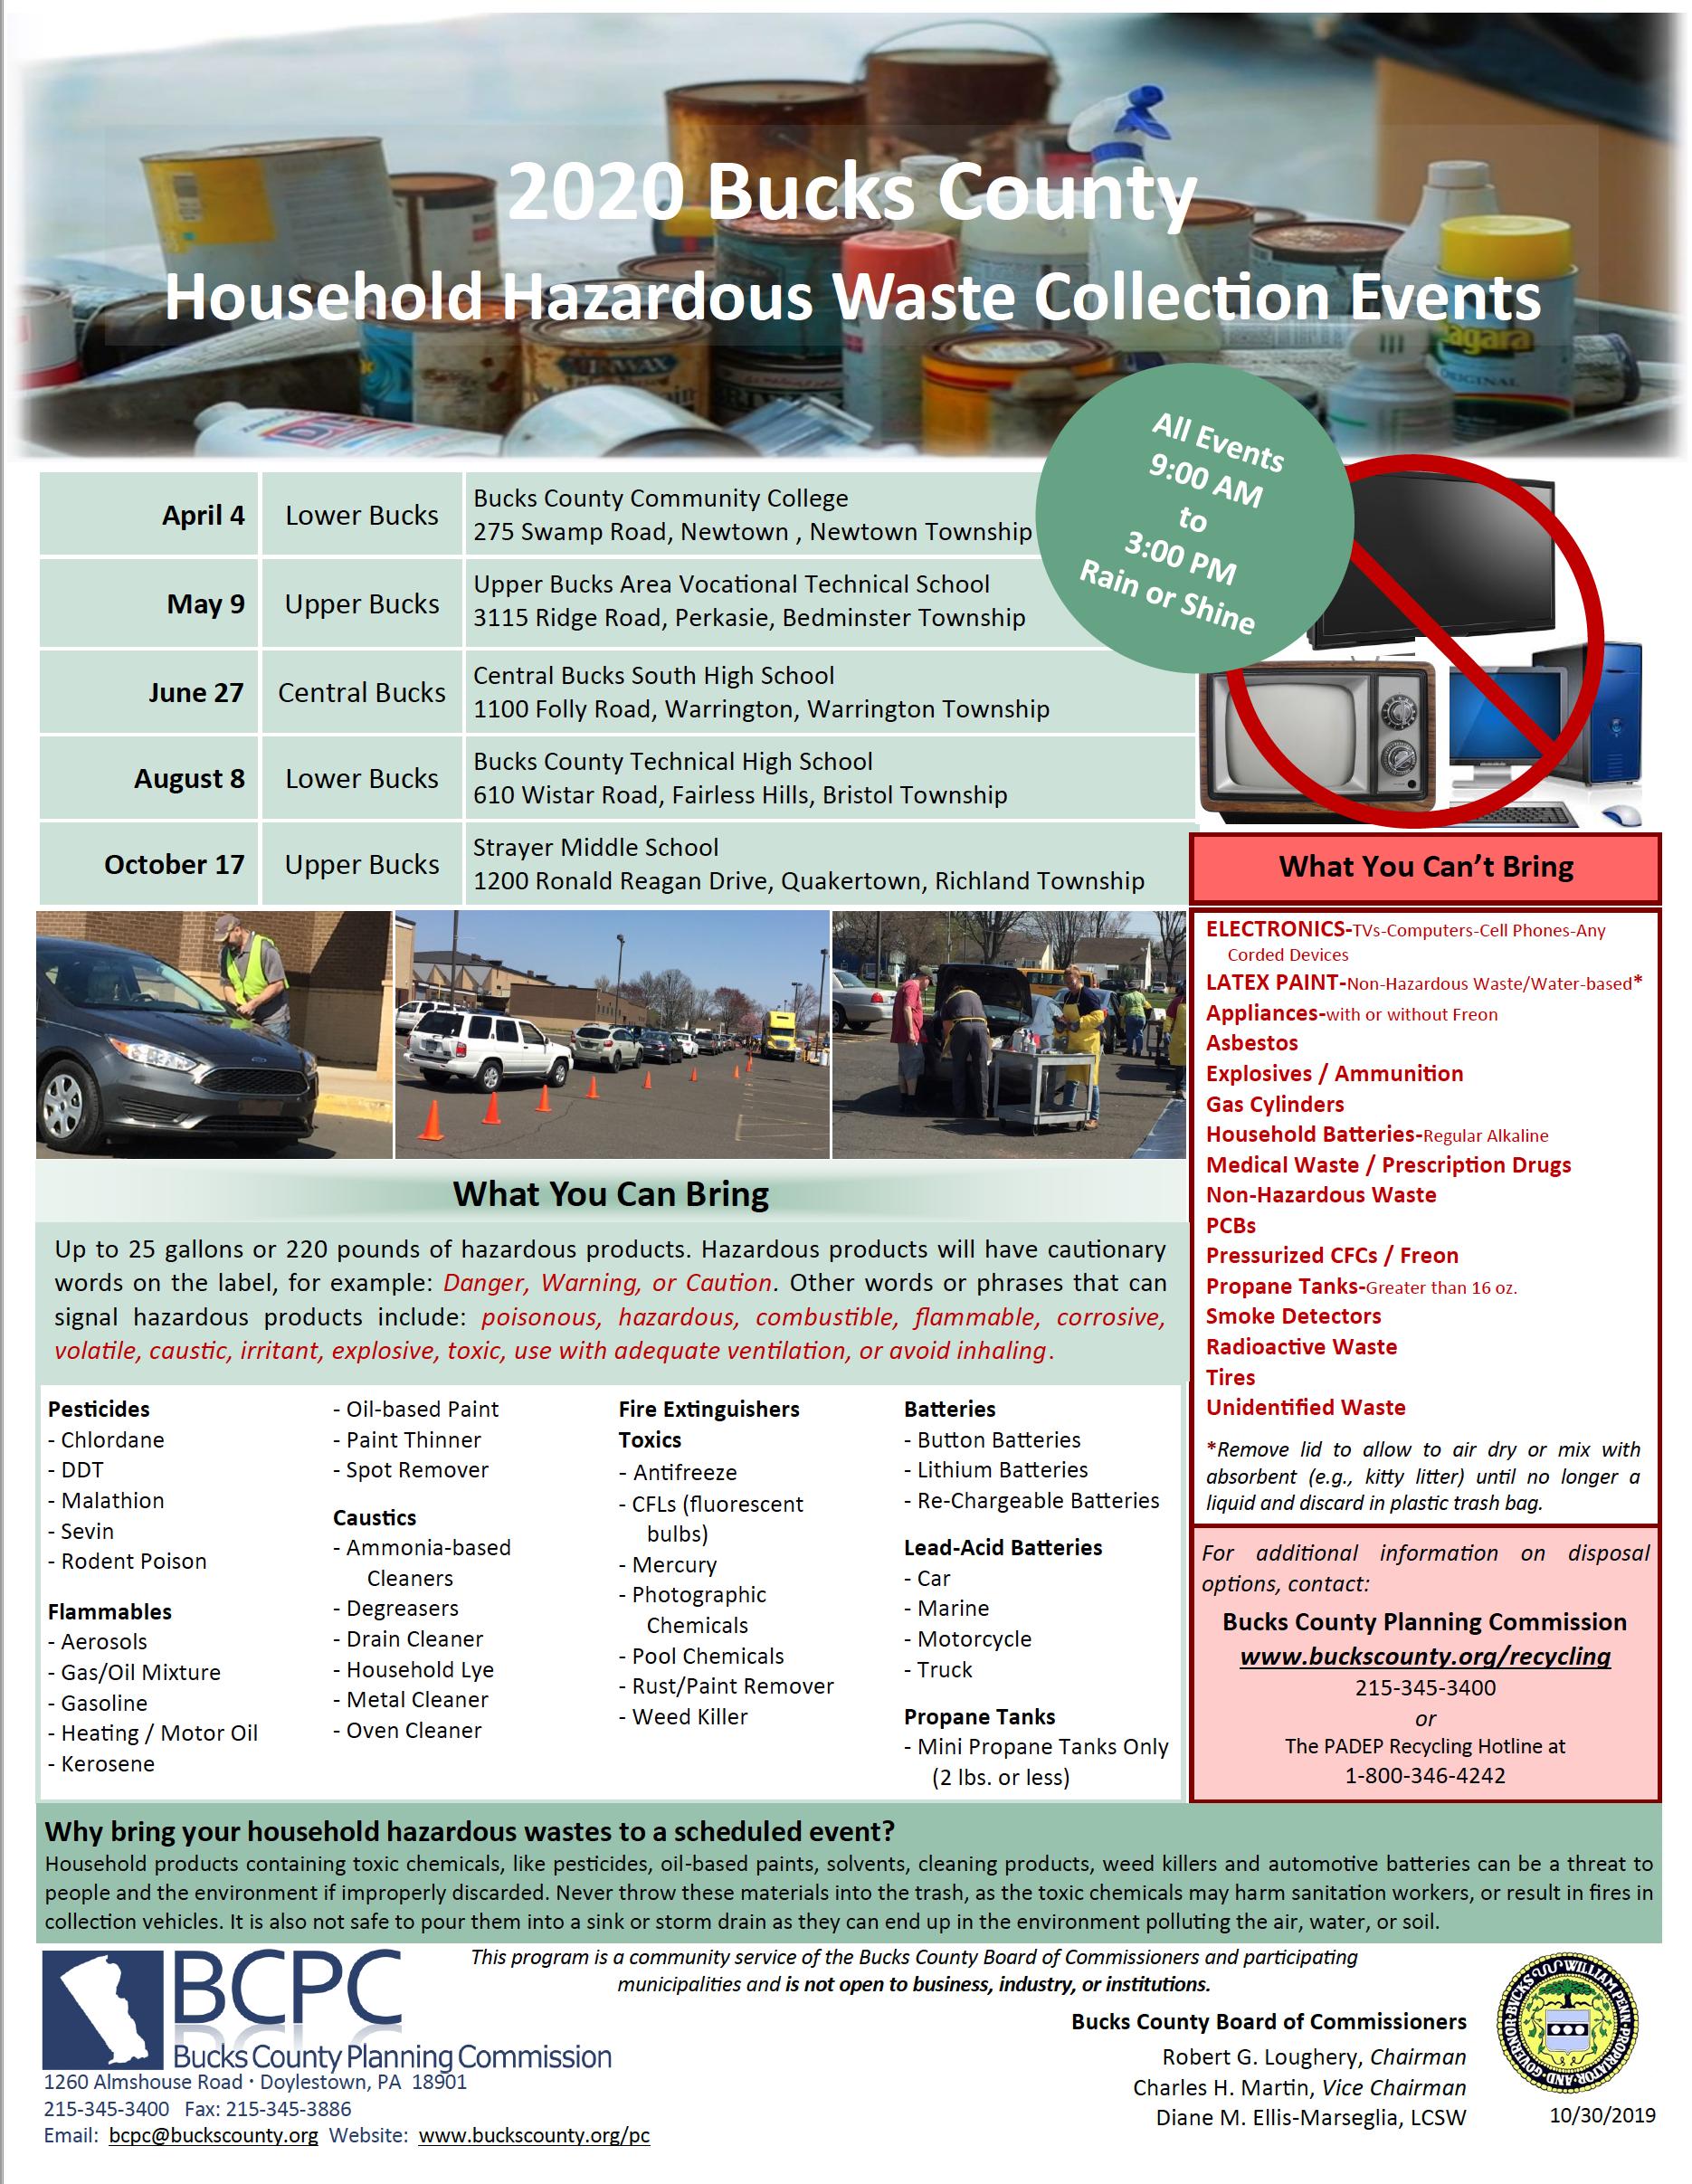 2020 Bucks County Household Hazardous Waste Collection Event